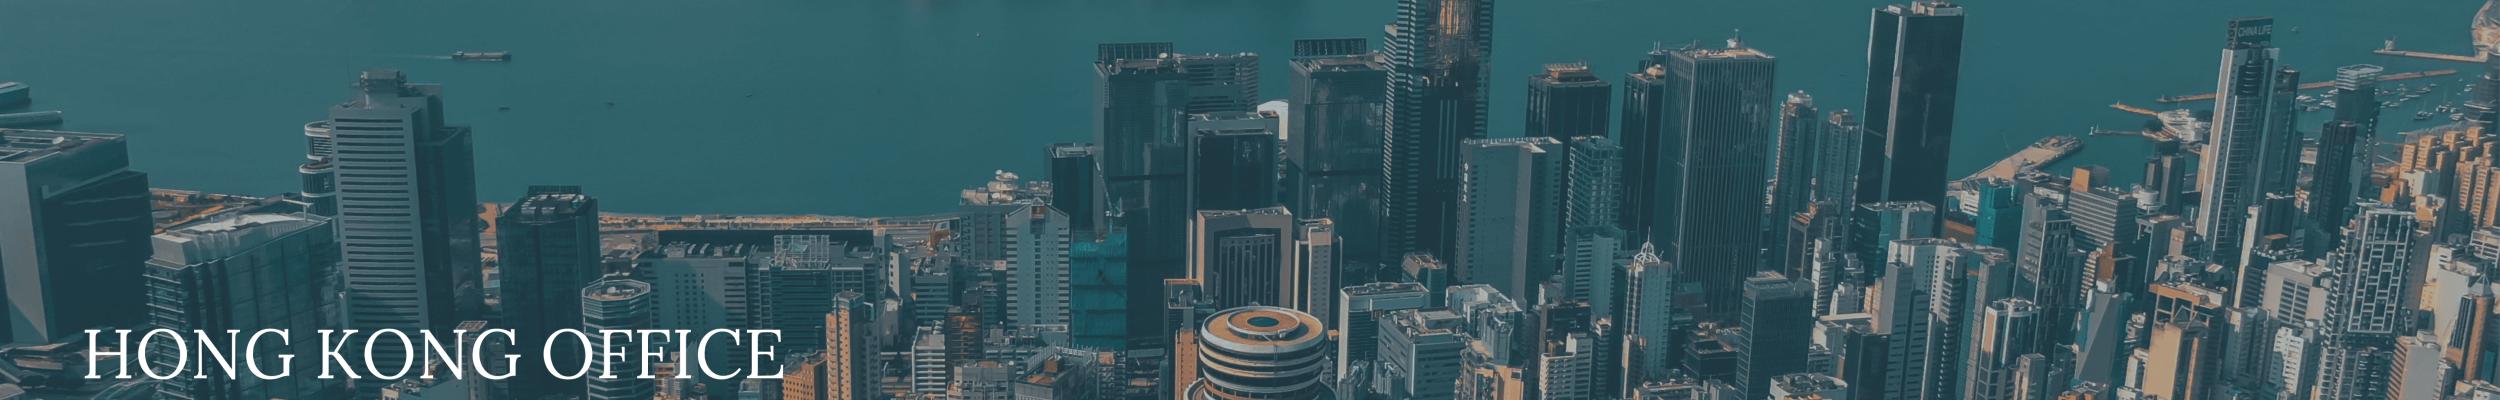 Lazarus Capital Partners Hong Kong Office